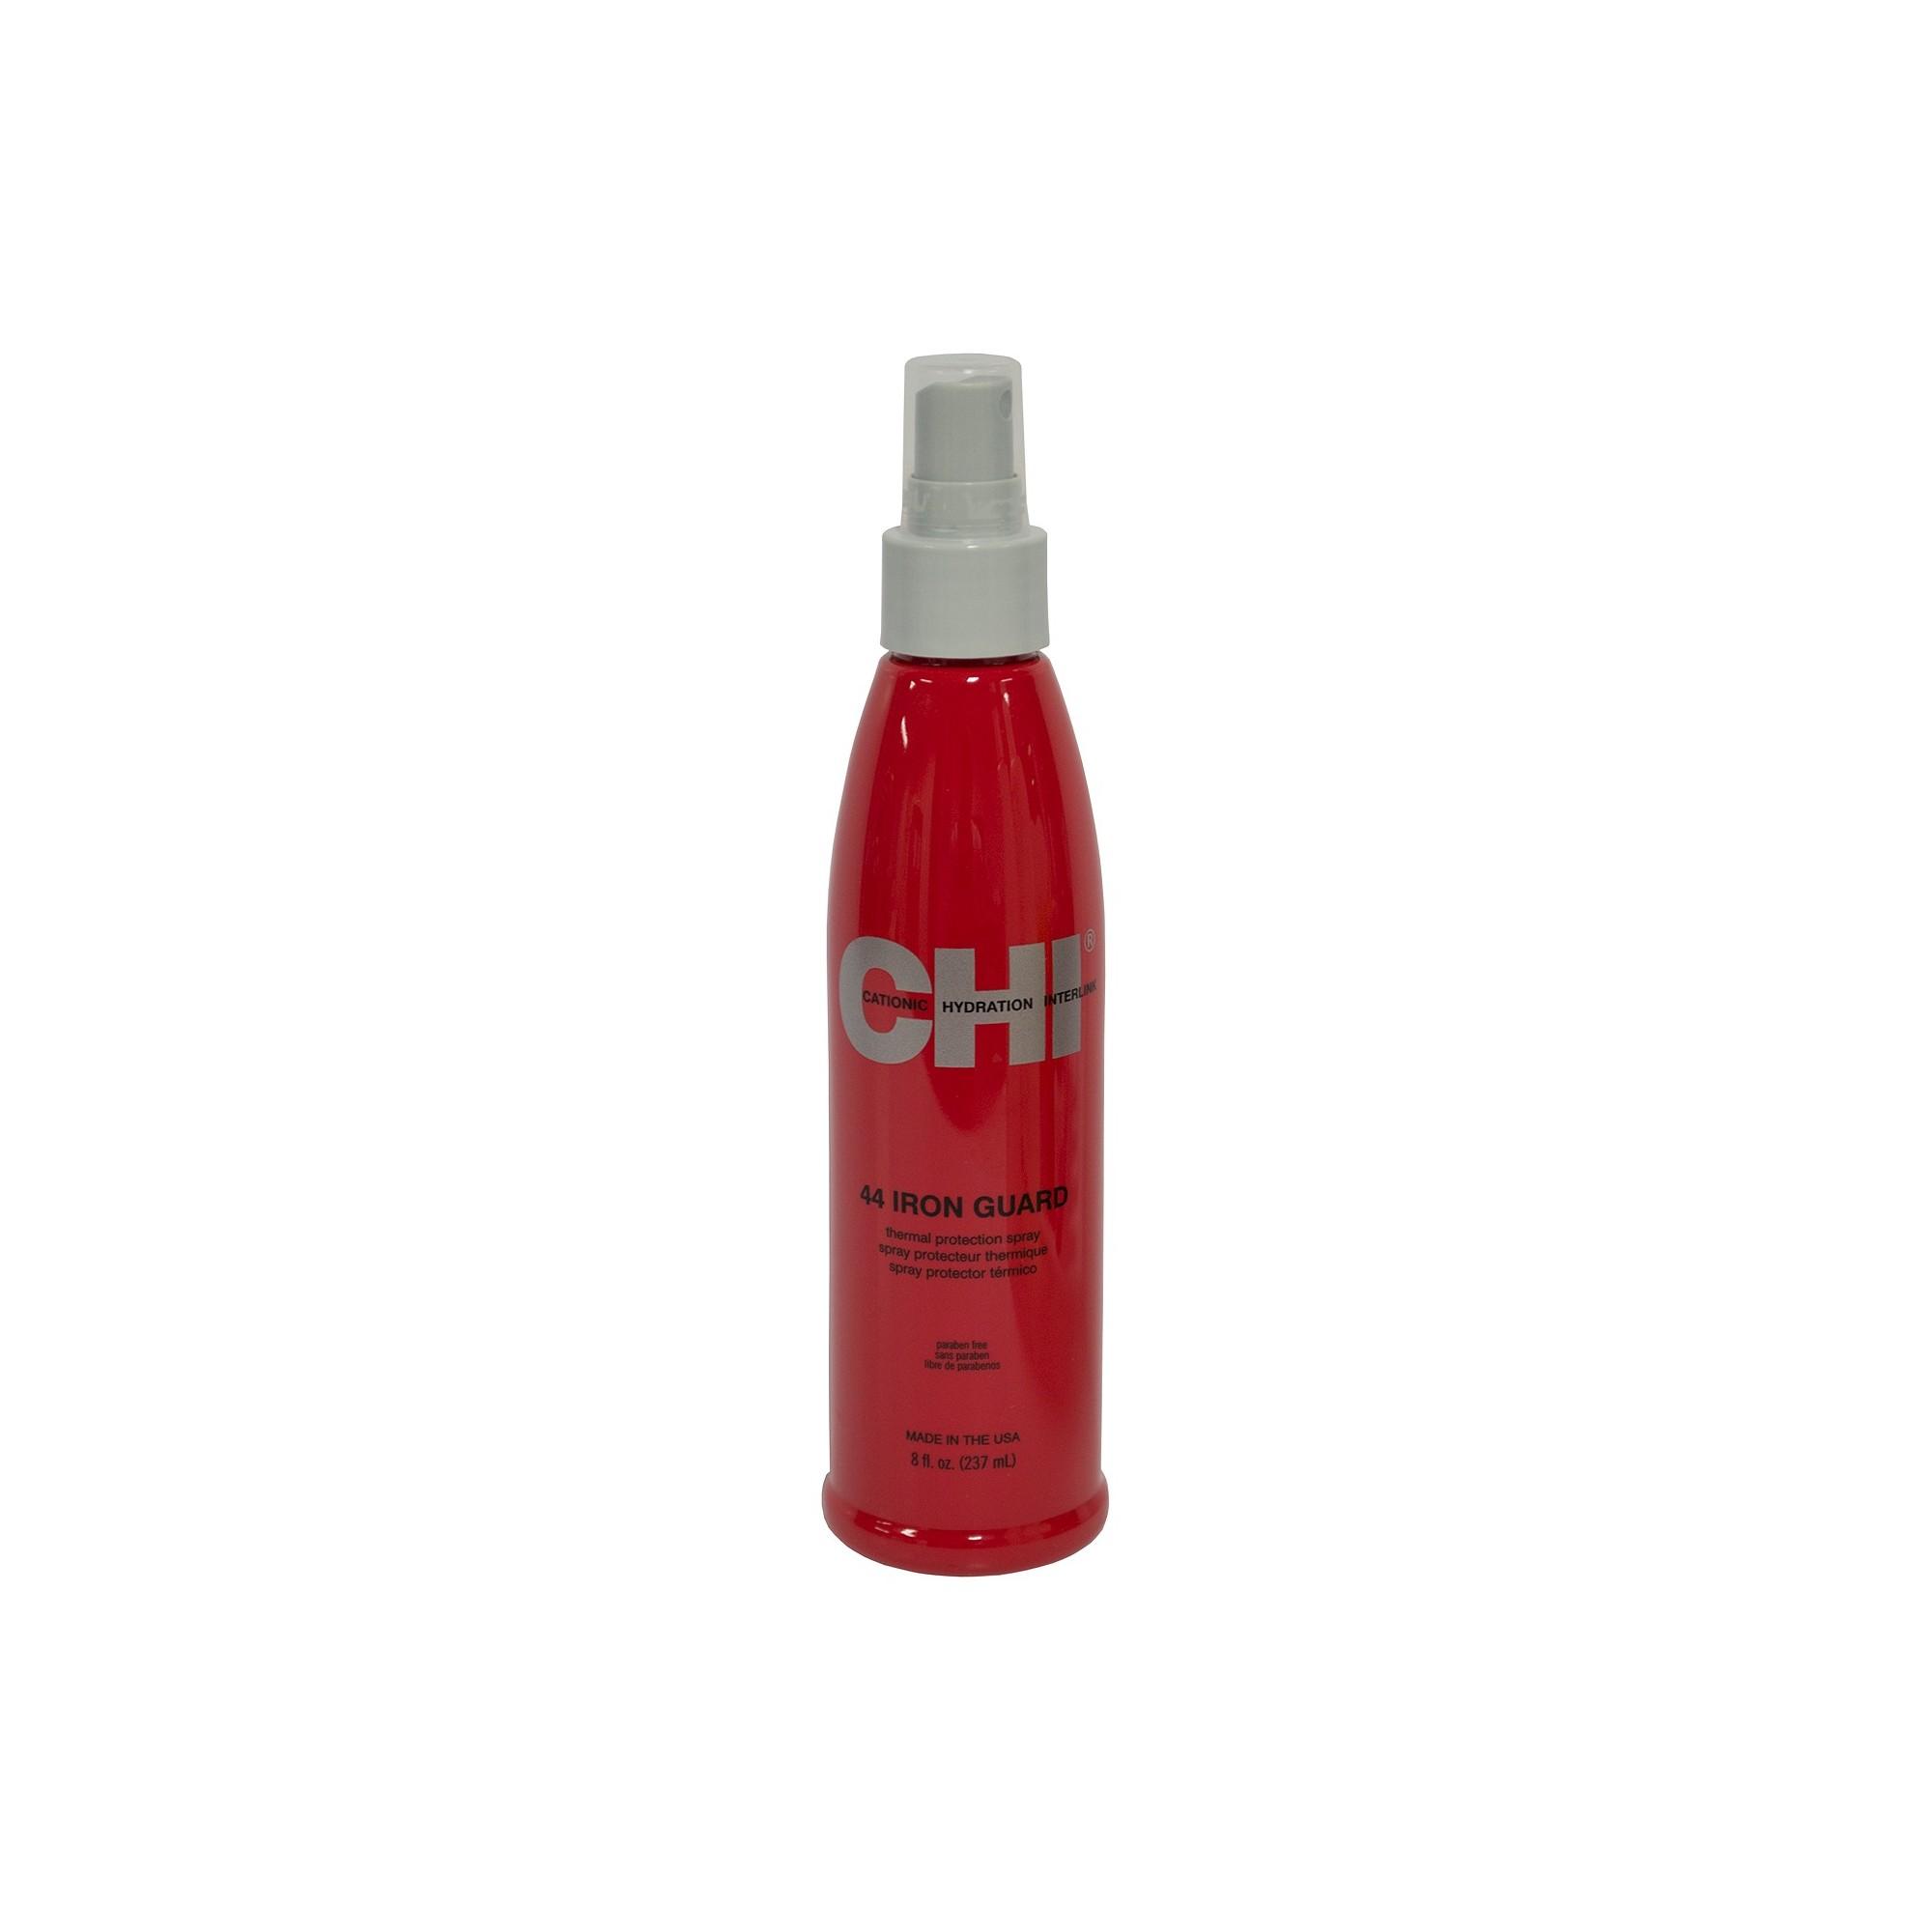 CHI 44 Iron Guard Thermal Protection Spray - 8.5 fl oz